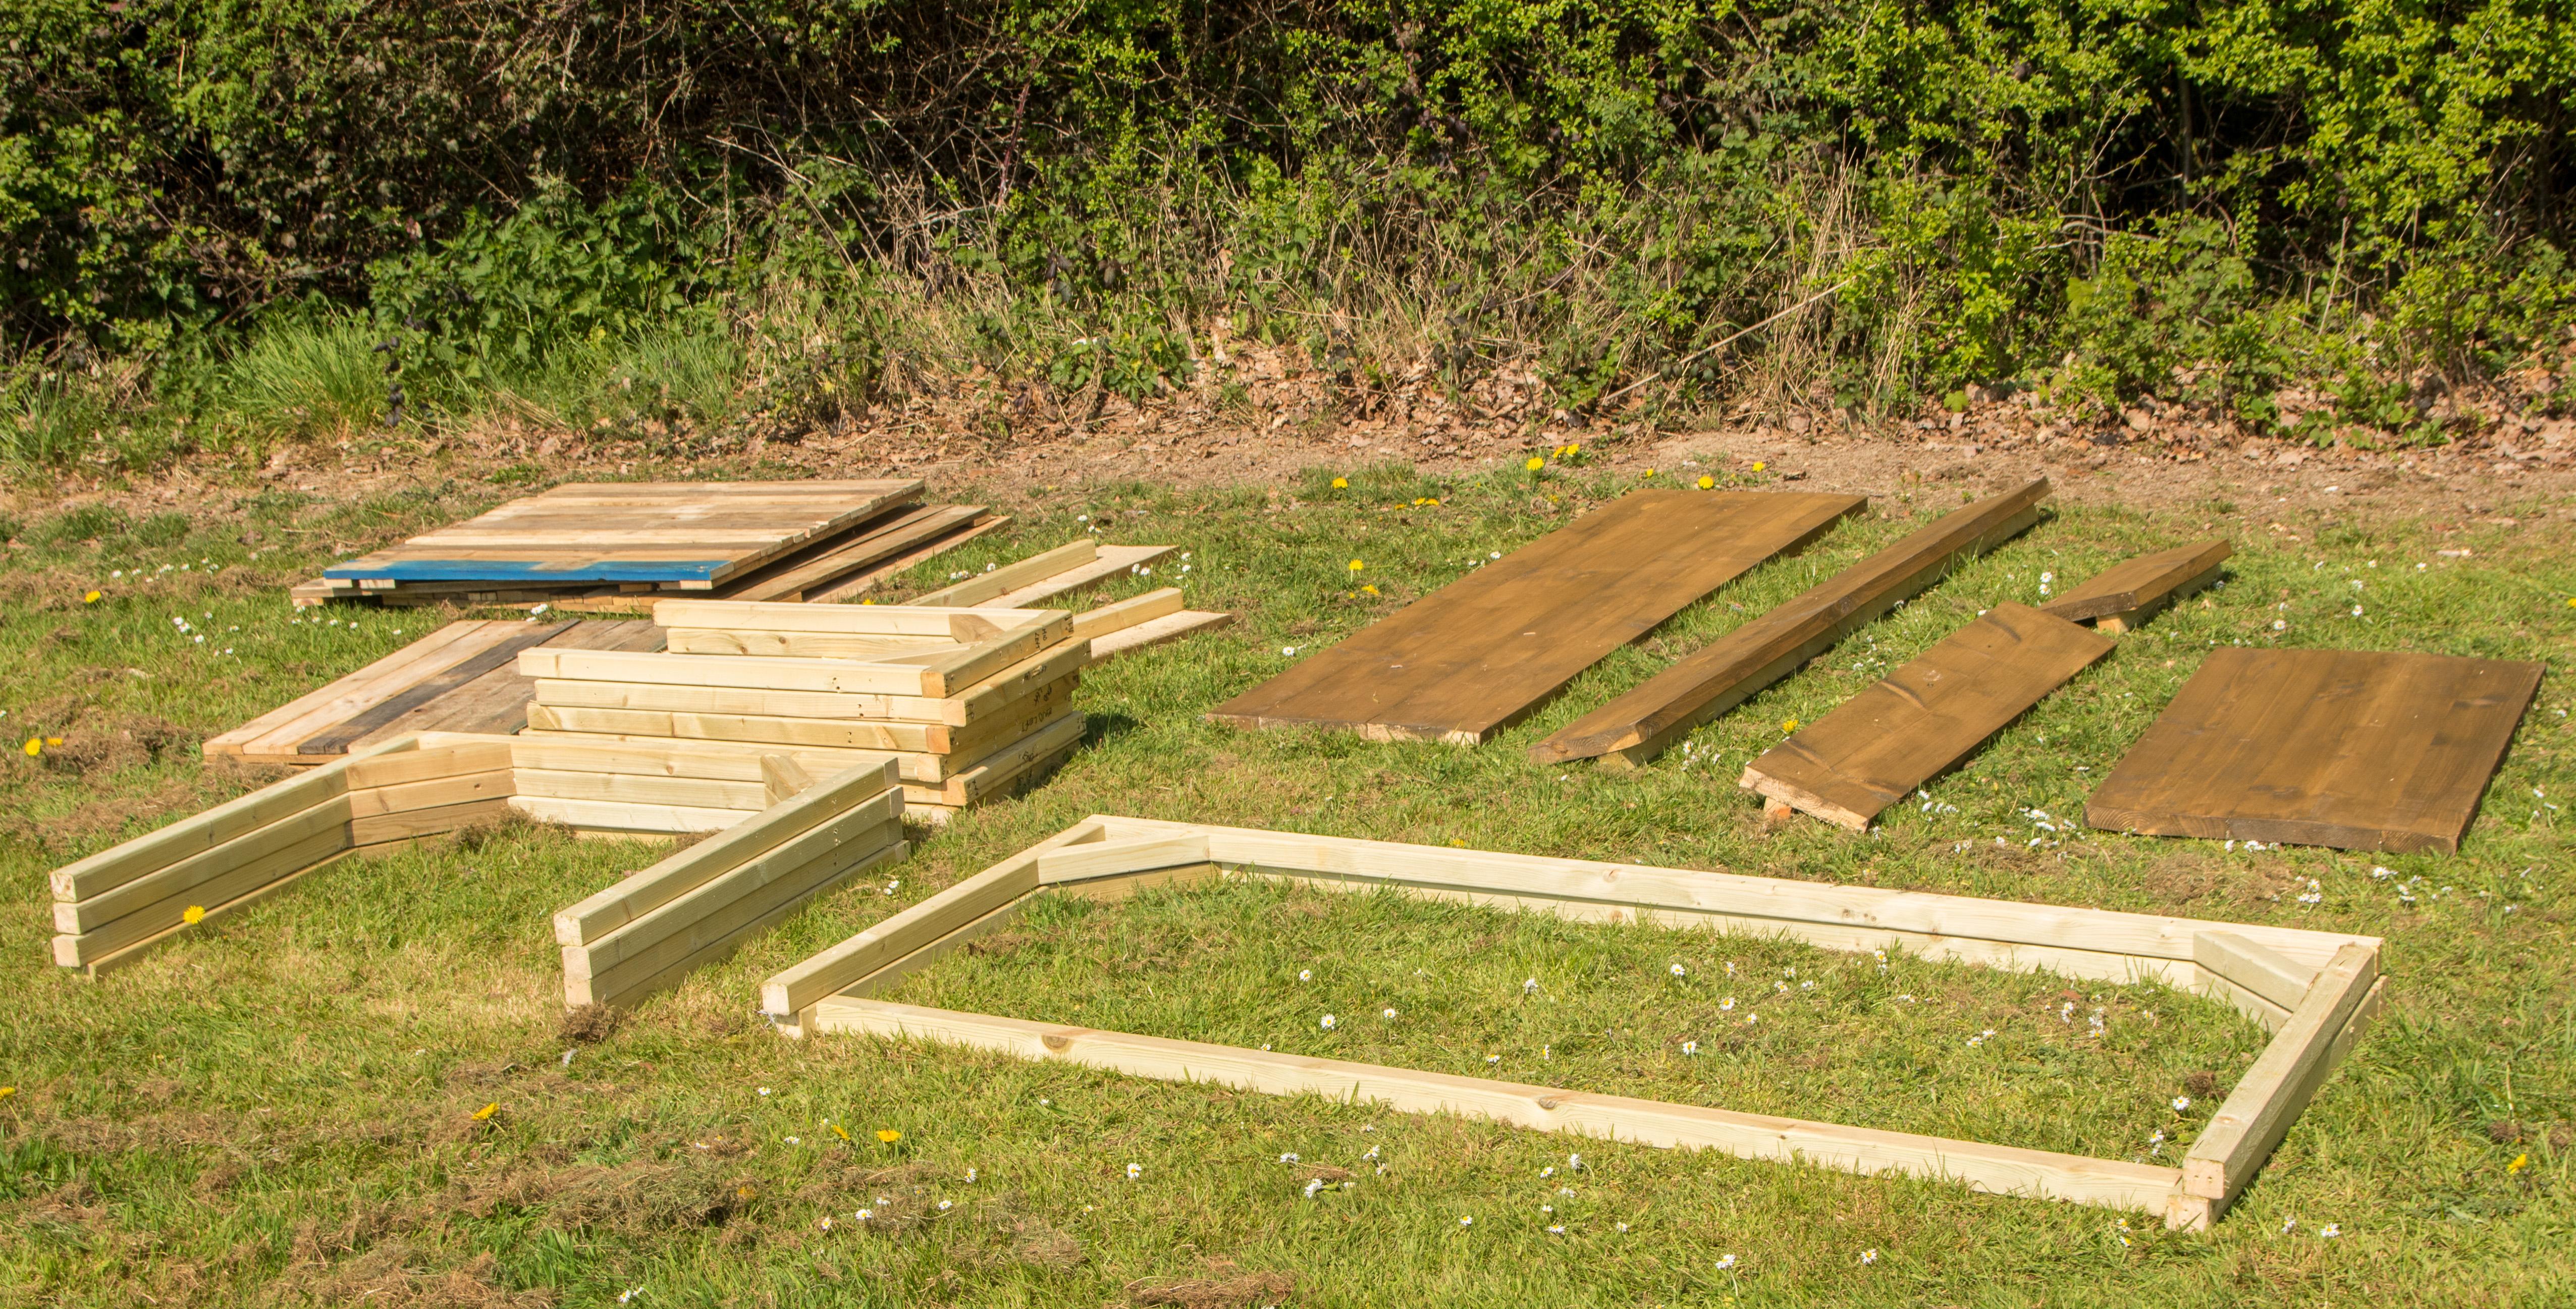 Pack flat wooden bars